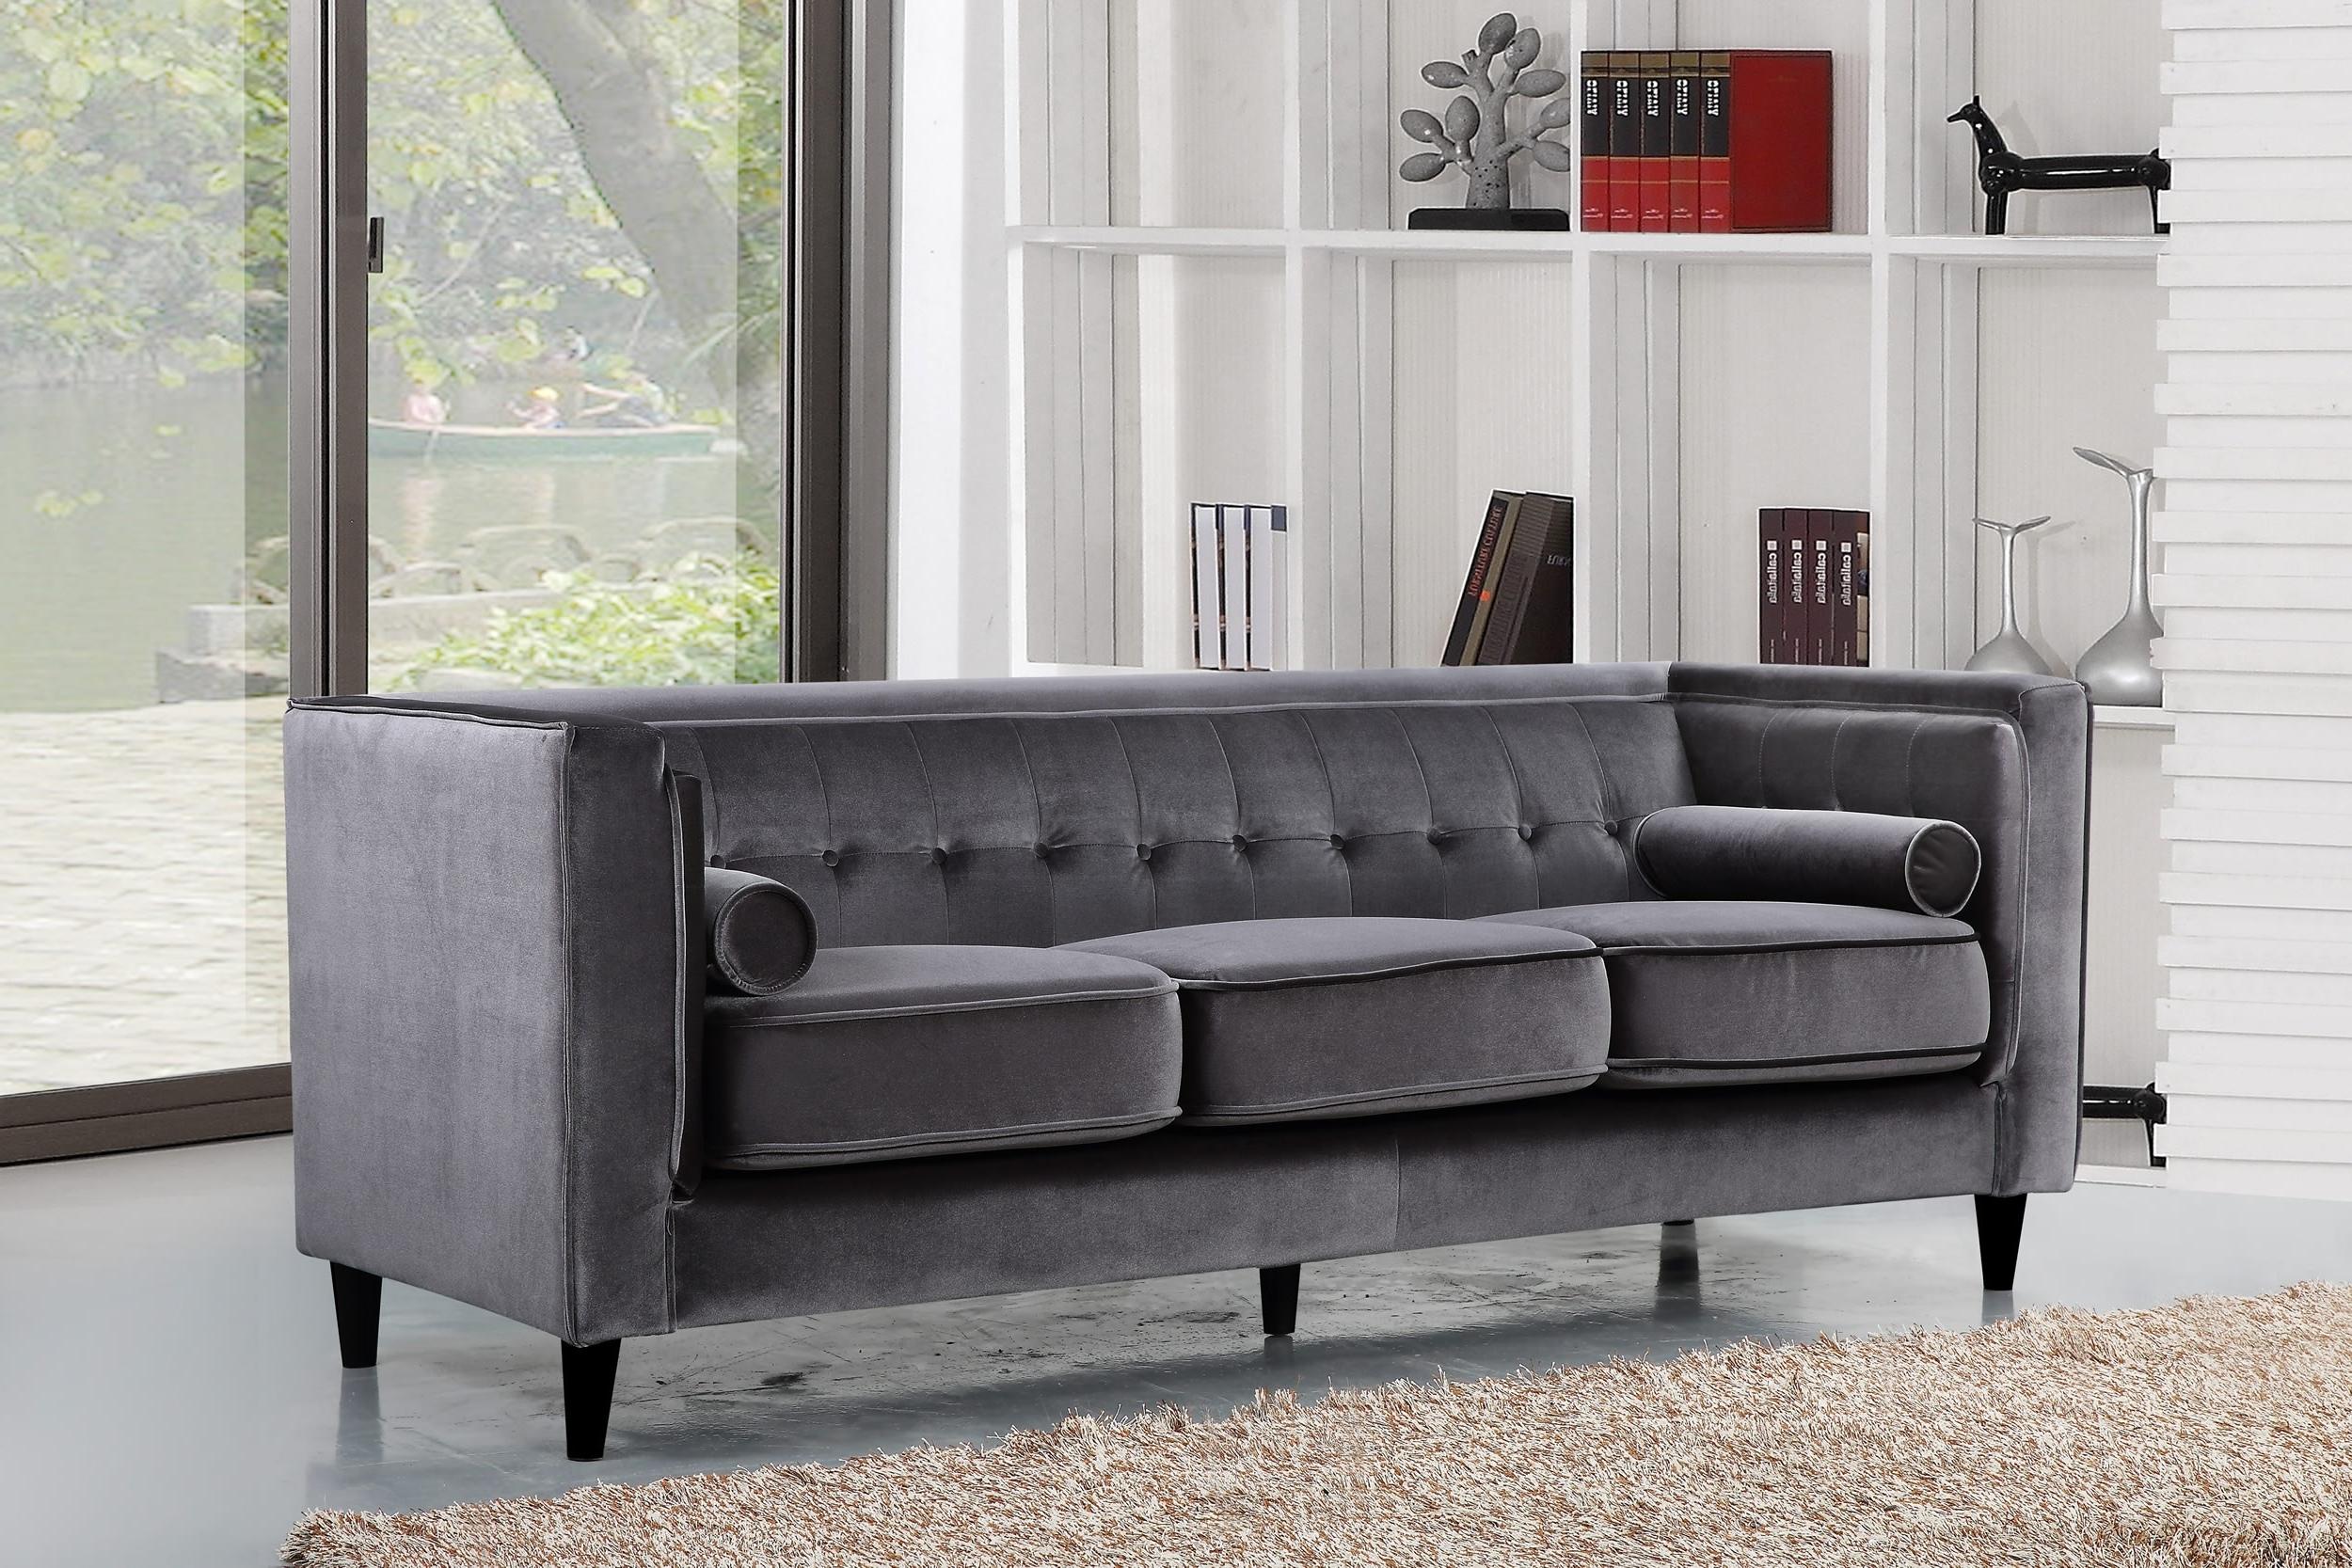 Taylor Velvet Sofa, Grey Buy Online At Best Price – Sohomod With Regard To Fashionable Velvet Sofas (View 8 of 15)